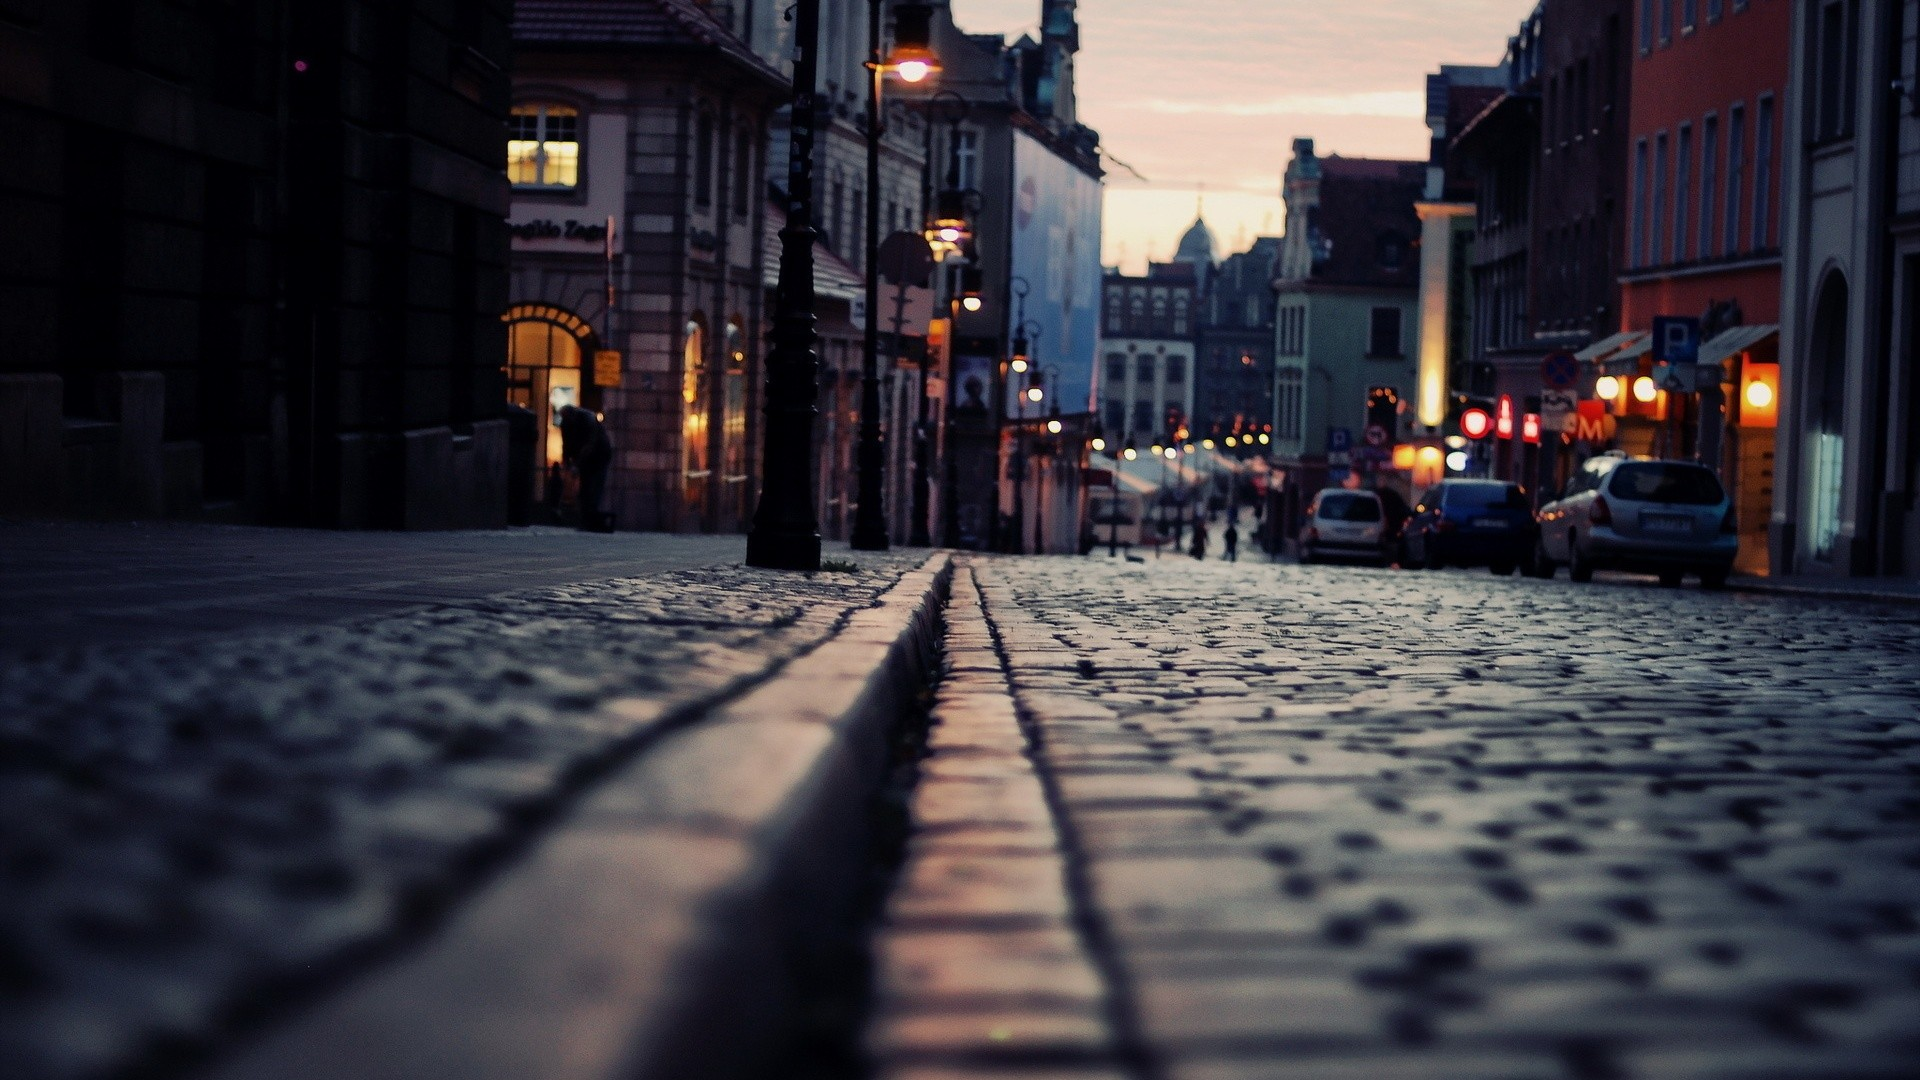 Night city street Wallpaper, Desktop Wallpapers, Free Wallpapers .